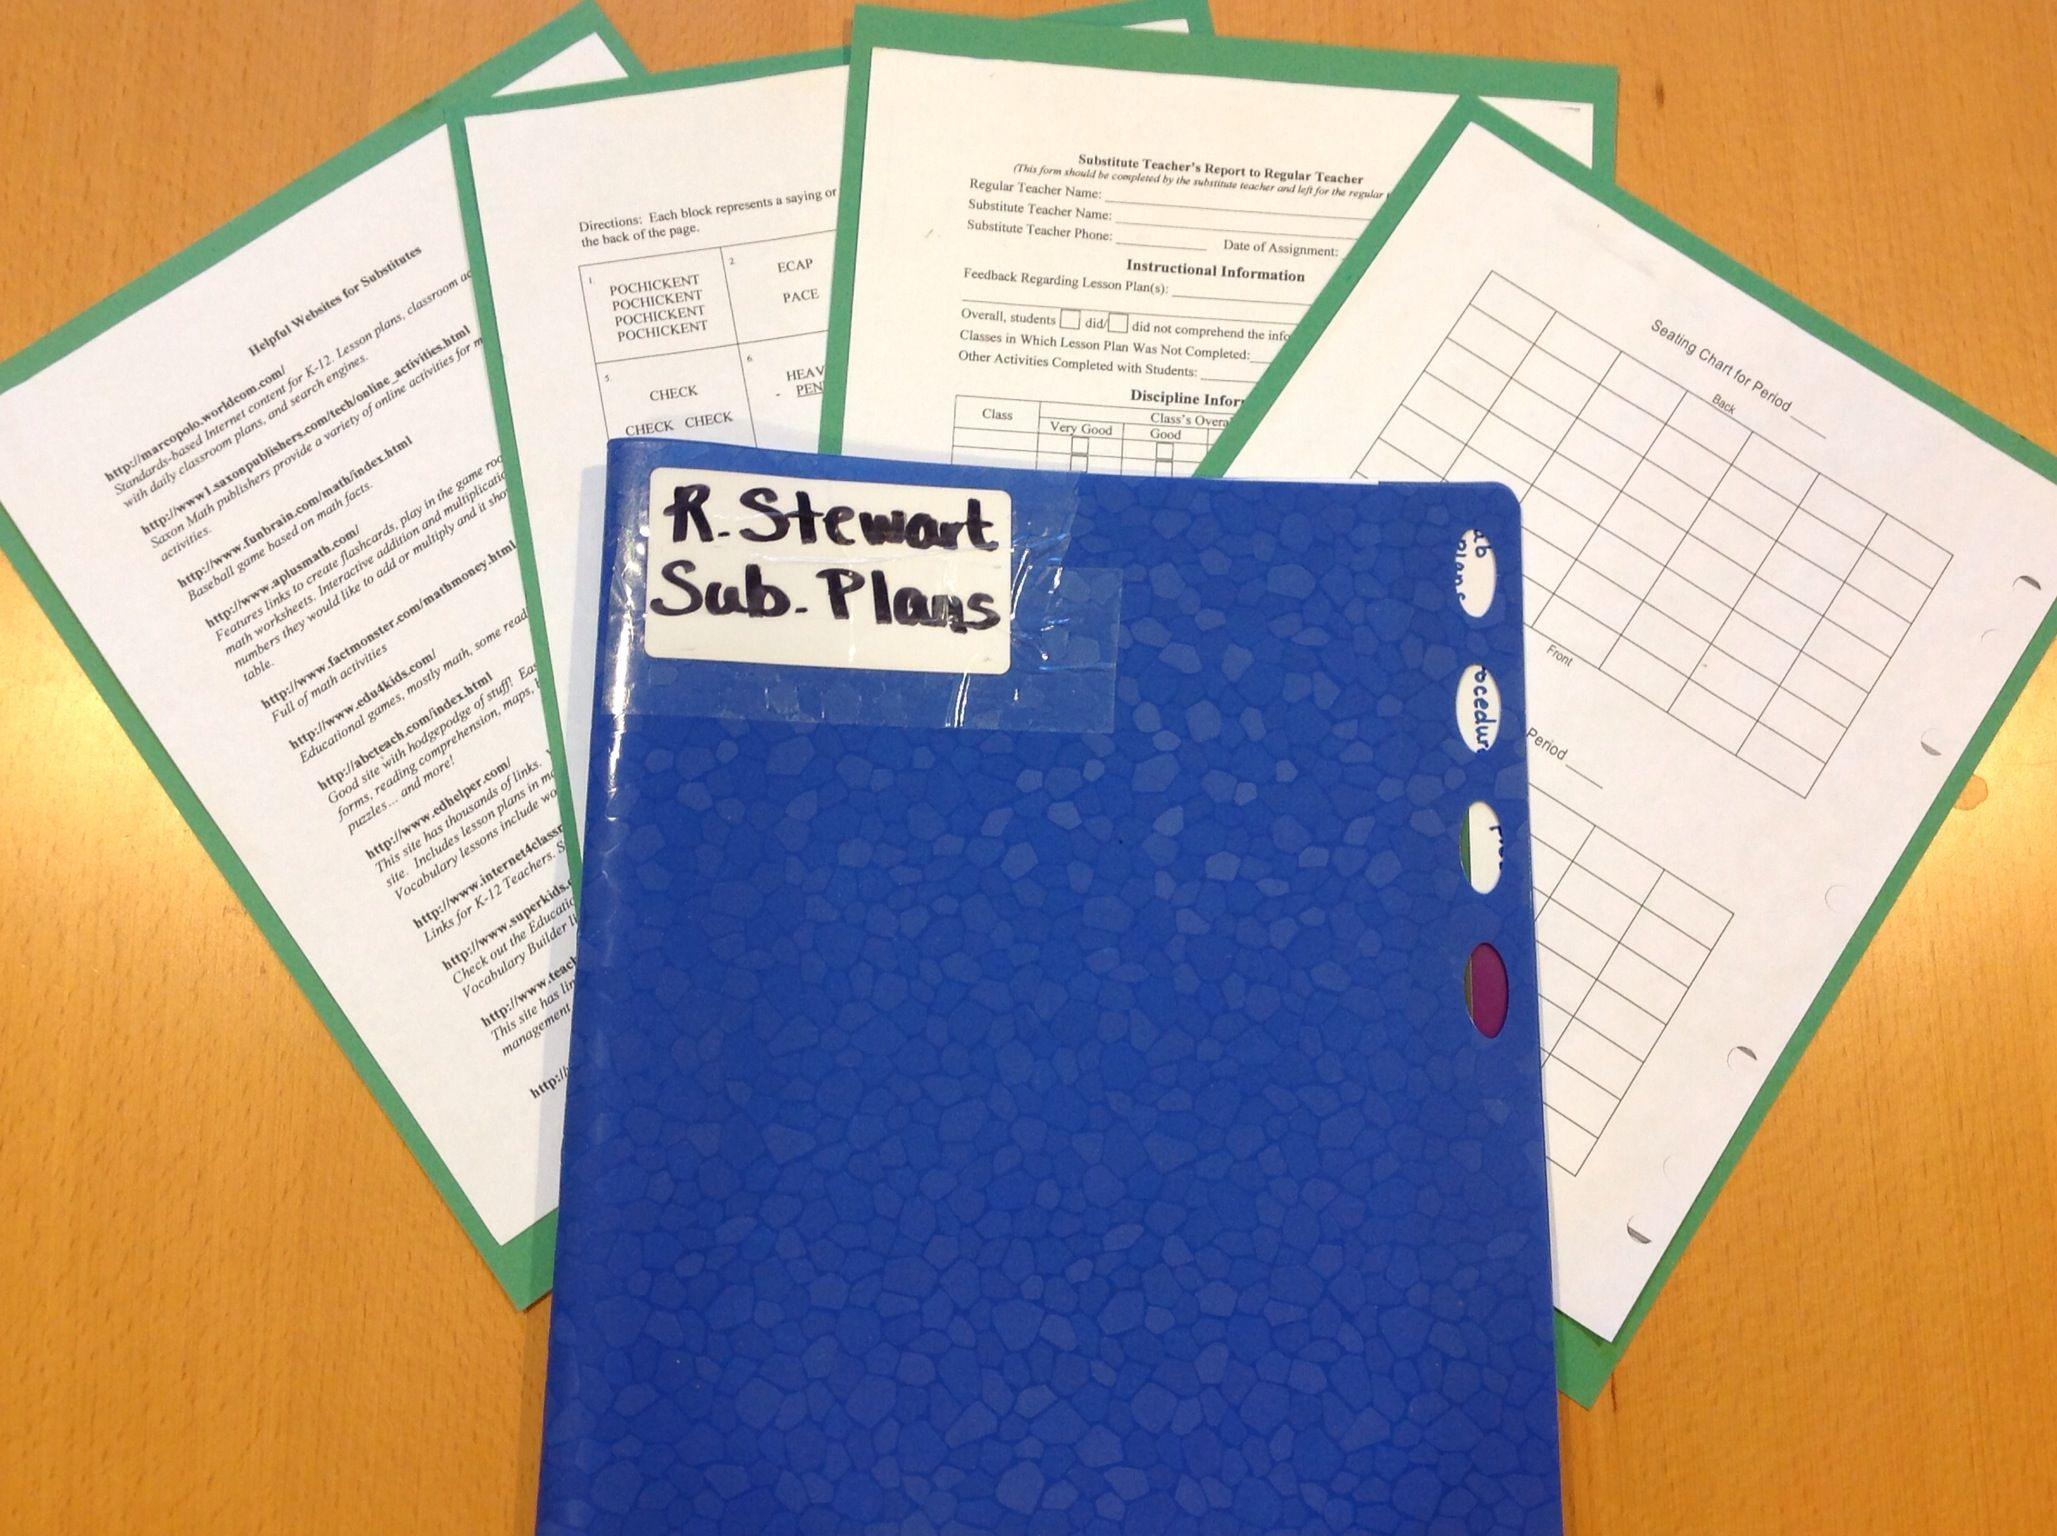 Your Substitute Teacher Folder Checklist Scholastic Com School Supplies For Teachers Substitute Teacher Substitute Teaching [ 1536 x 2057 Pixel ]